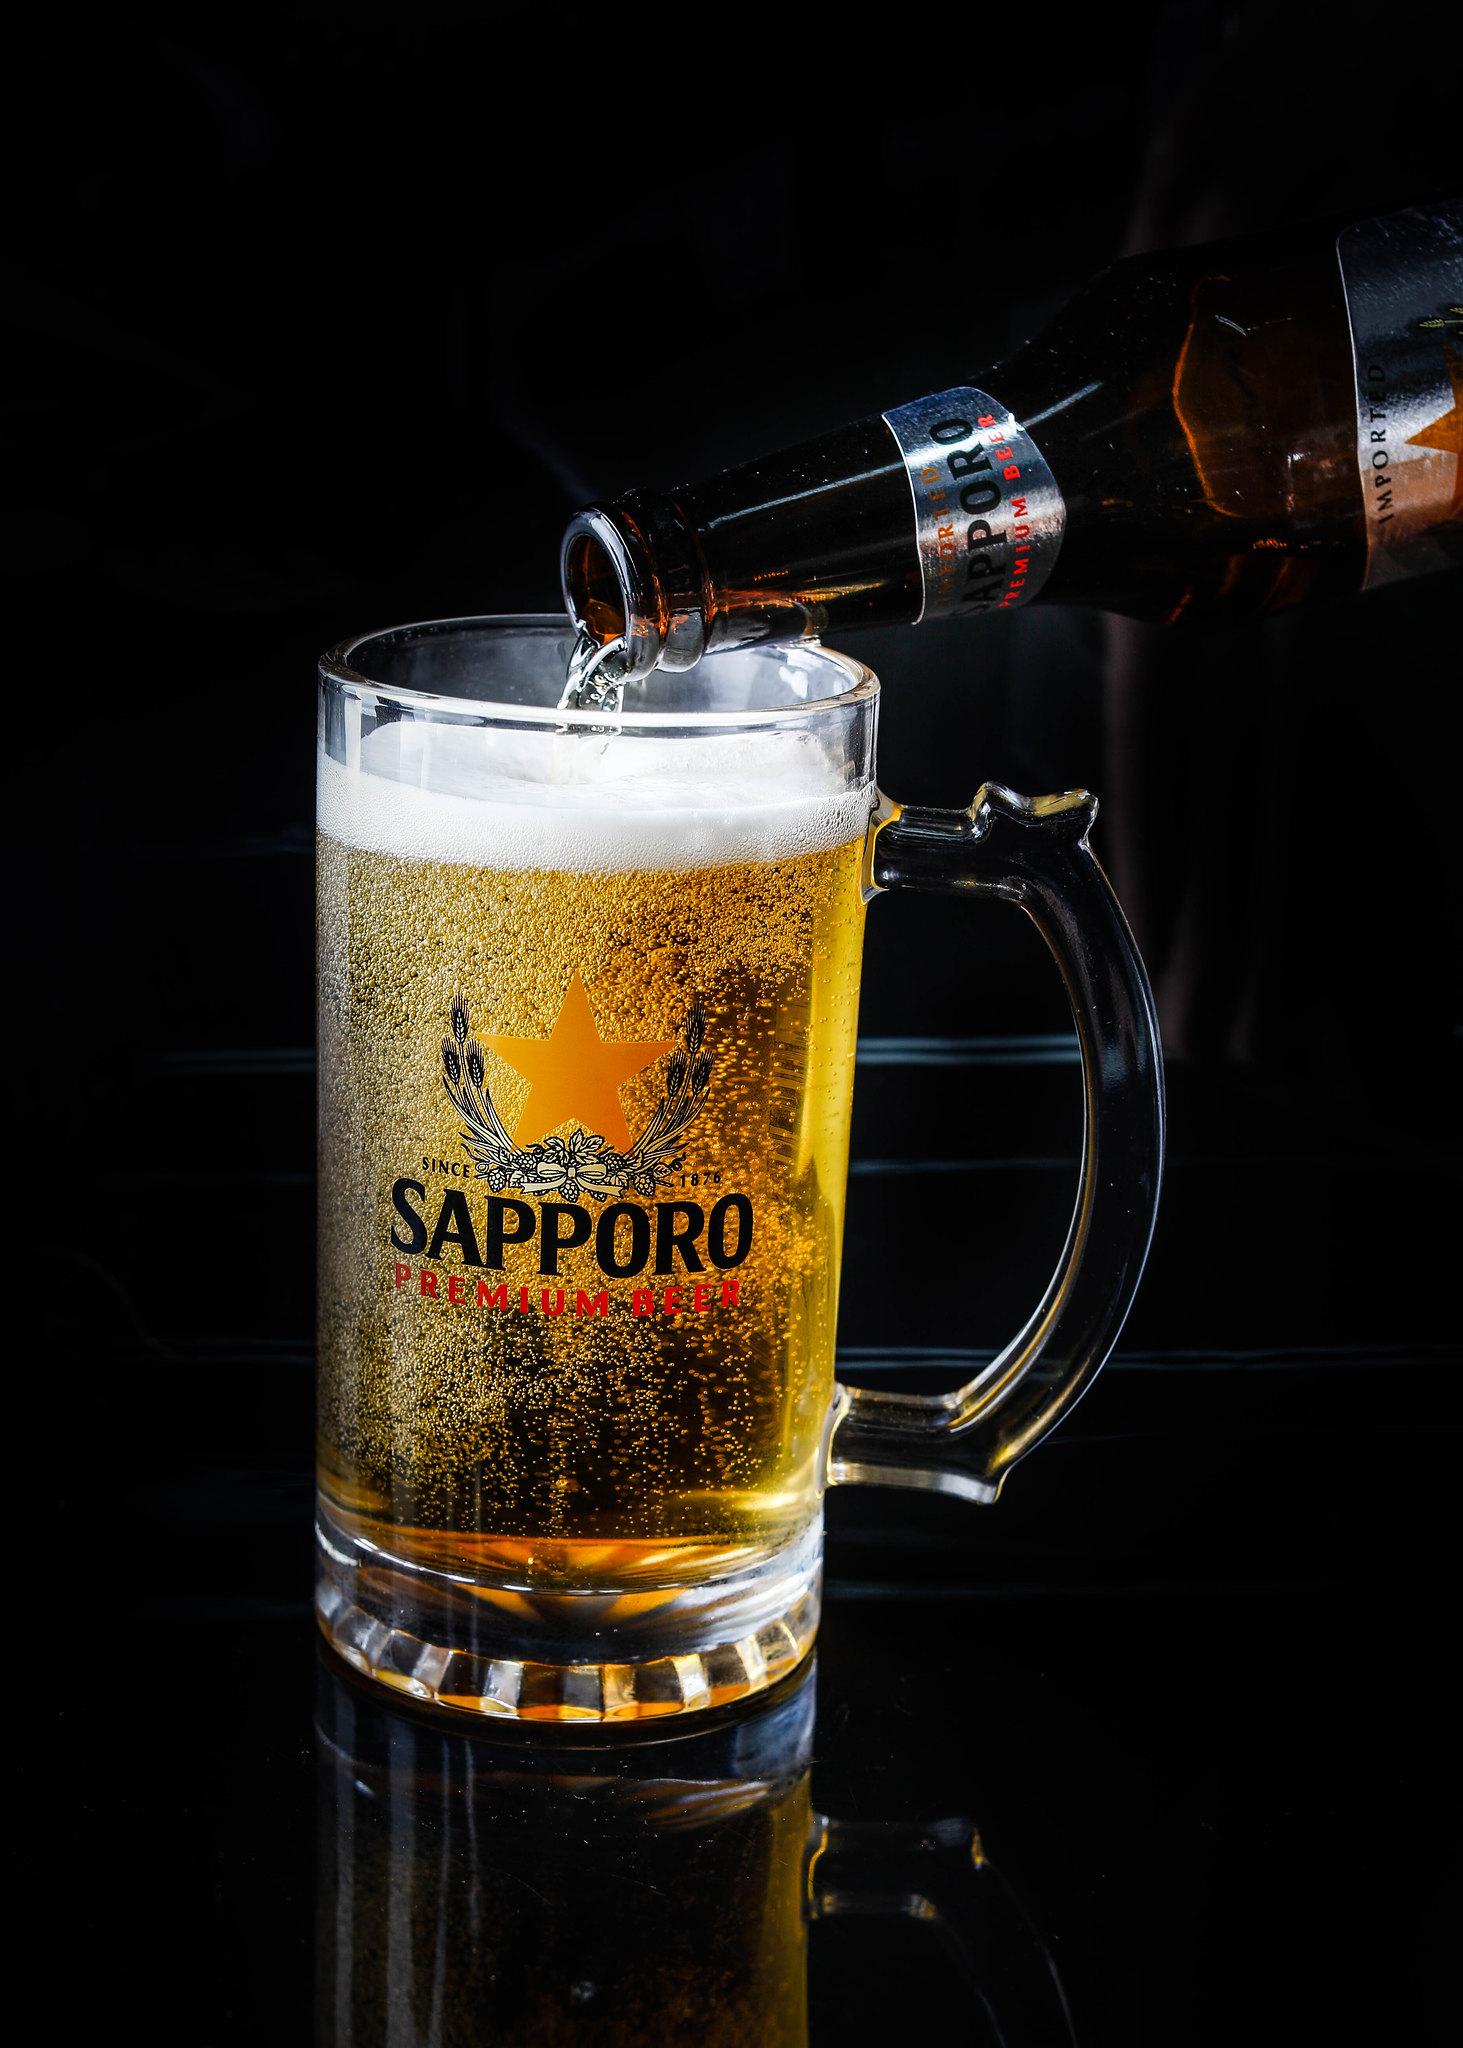 Pouring Sapporo Premium Beer